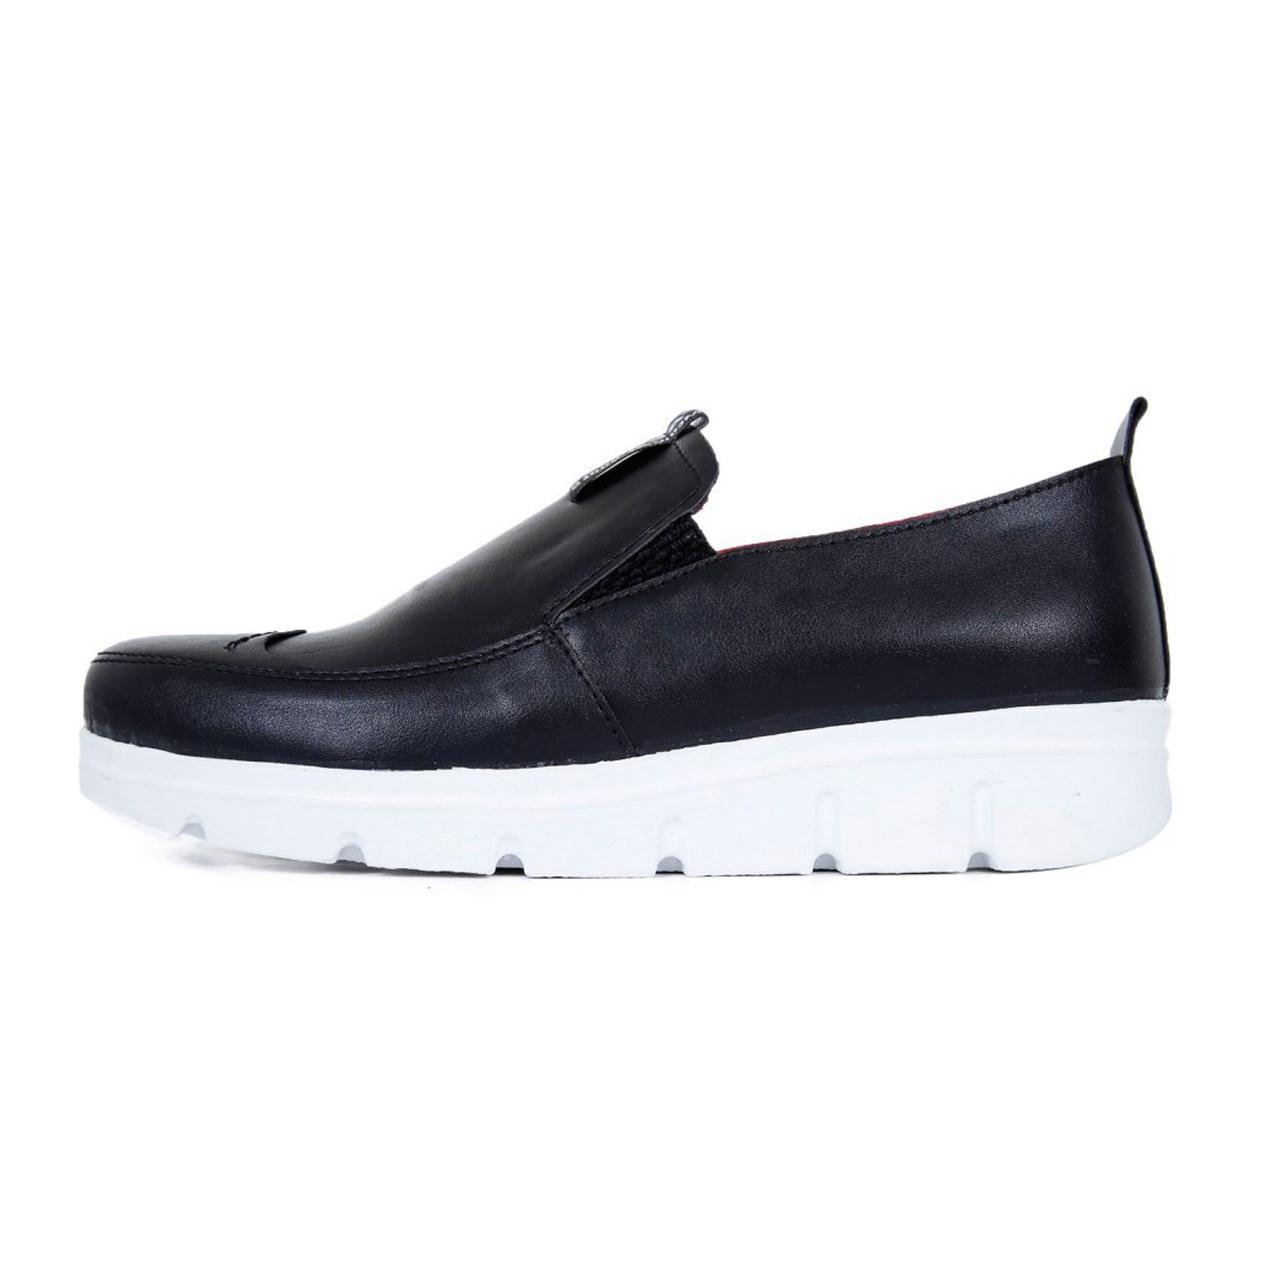 قیمت کفش زنانه پادوکاس مدل 2115